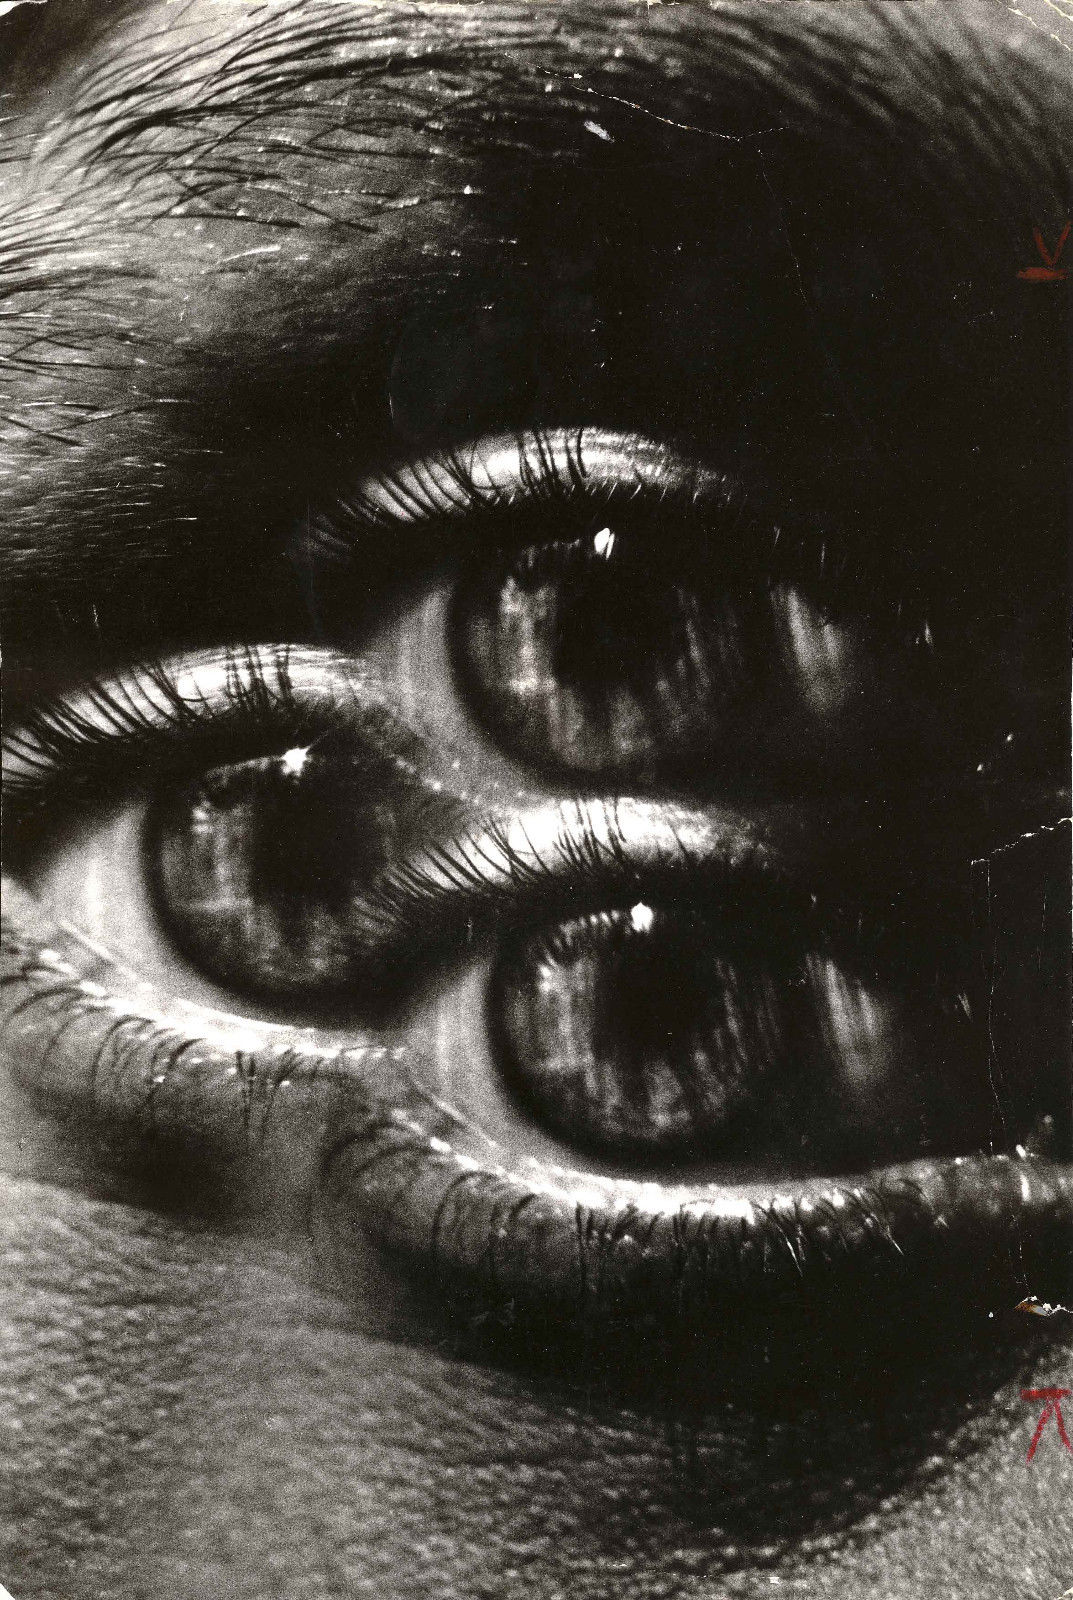 Triple Eye by Jeanloup Sieff (1972)